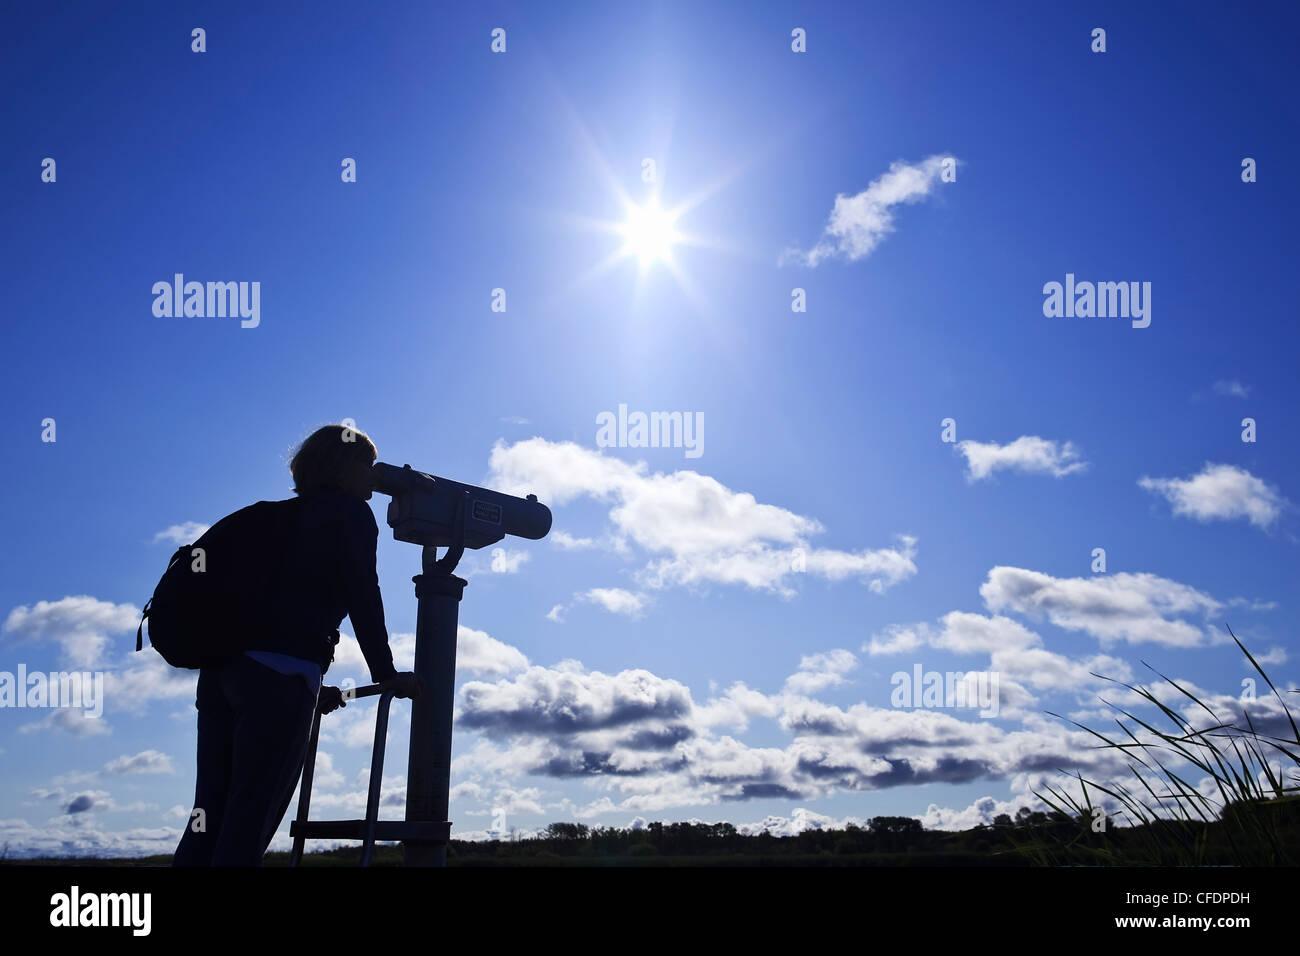 Frau, die durch ein Teleskop, Vogelbeobachtung, Grassy Narrows Marsh, Hecla Island Provincial Park, Manitoba, Kanada. Stockbild